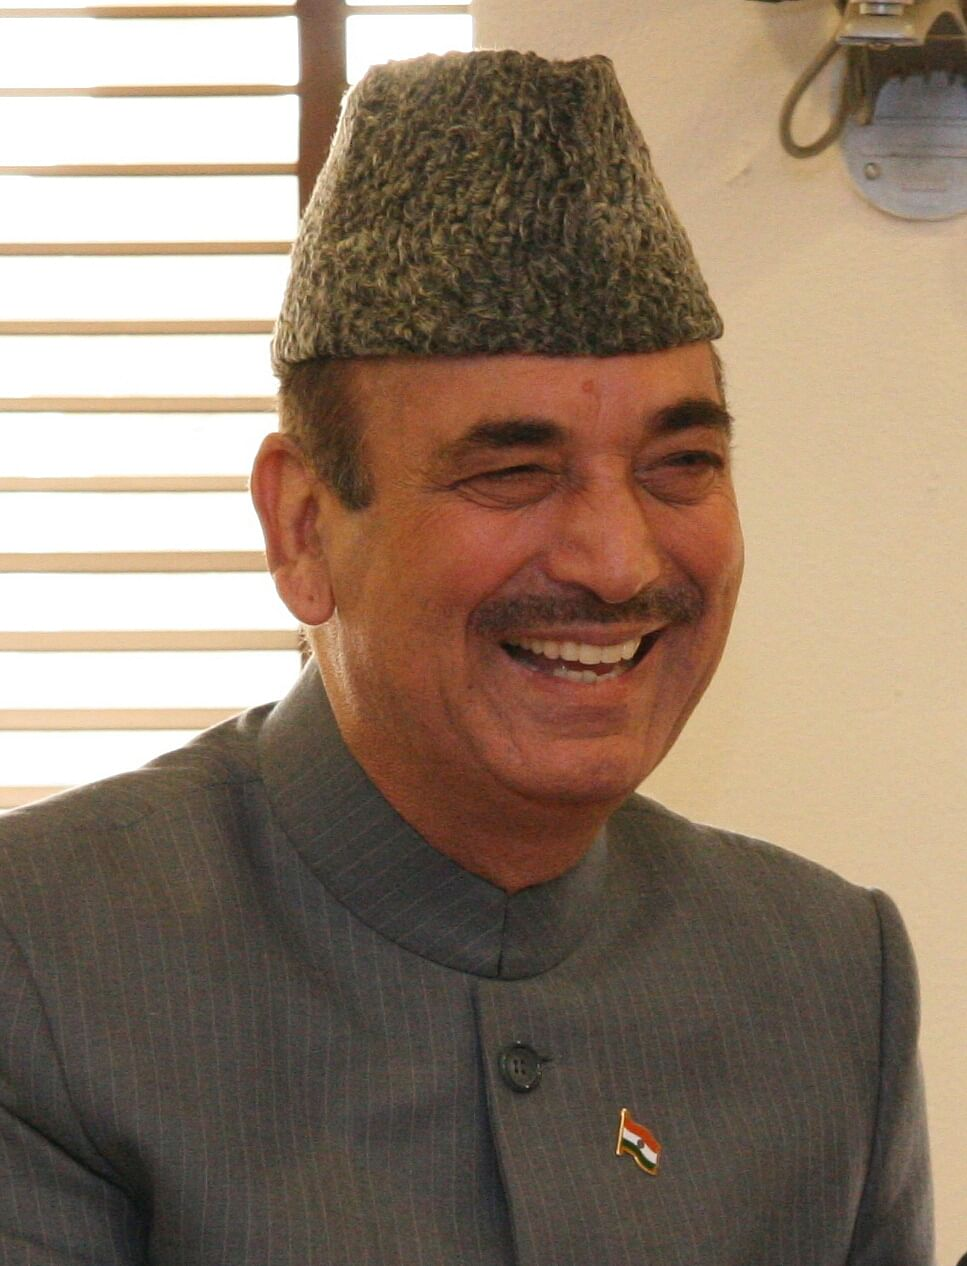 बिहार के मुख्यमंत्री नीतीश कुमार (Nitish Kumar) और उपमुख्यमंत्री सुशील कुमार मोदी (Sushil Kumar Modi)